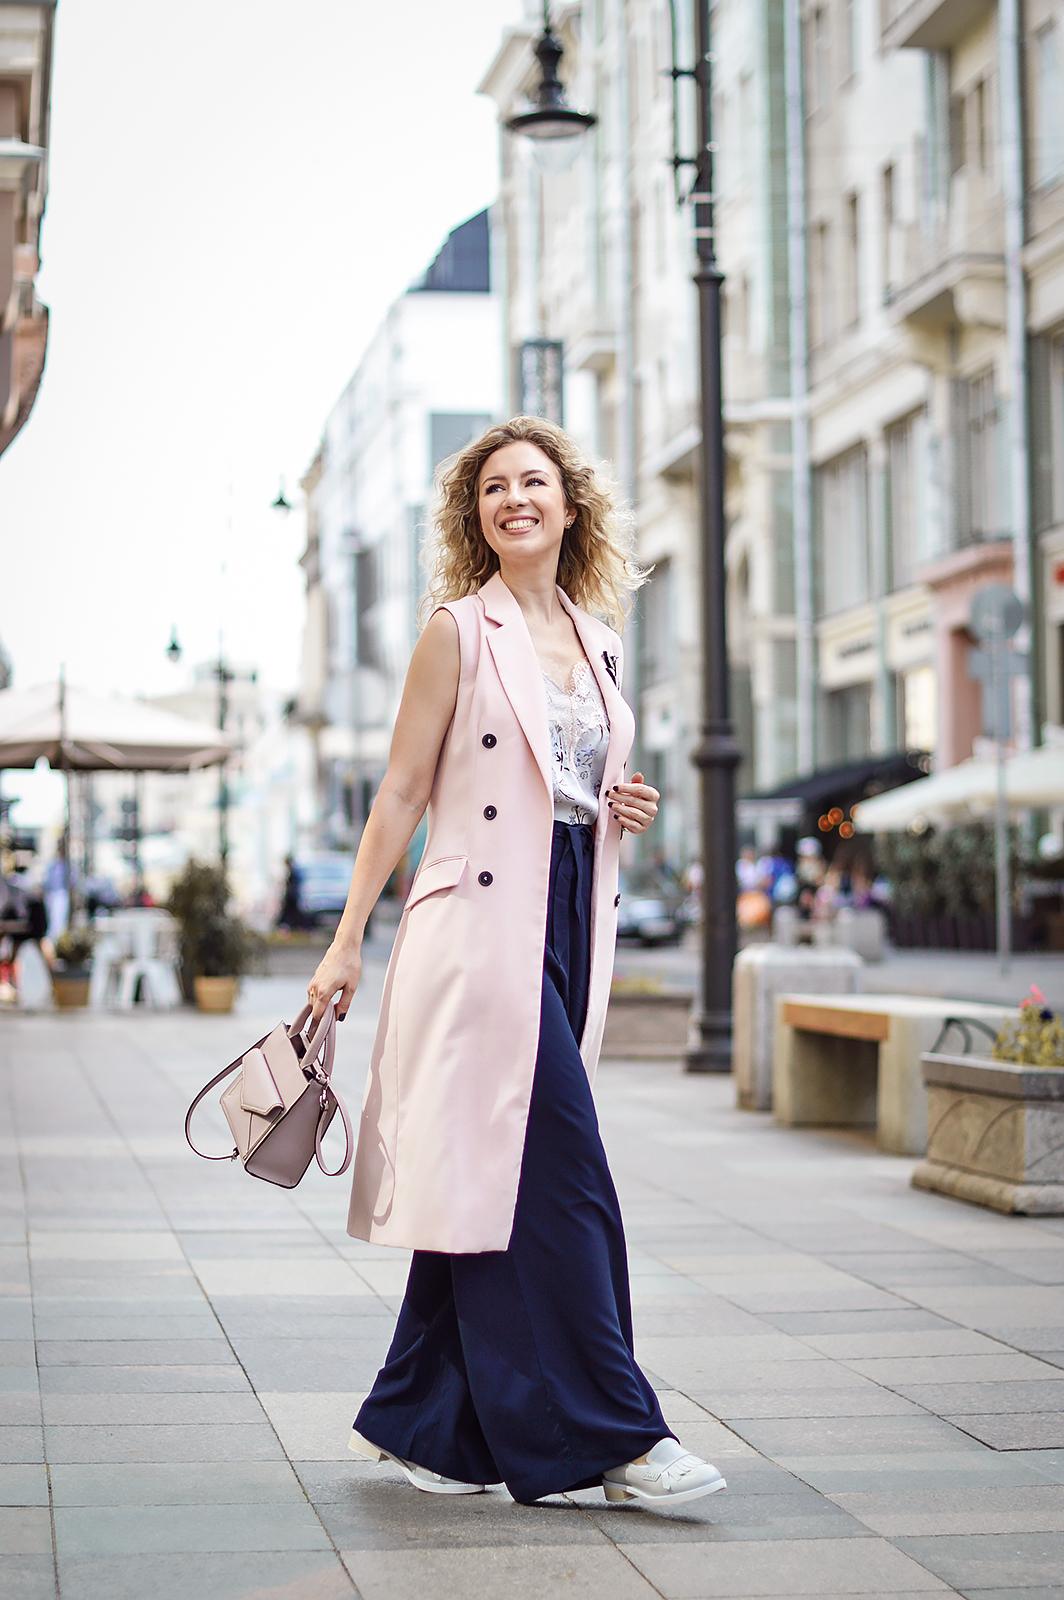 rita_maslova_streetstyle_pink_pastel_look_summer_oytfit_palazzo_pants_